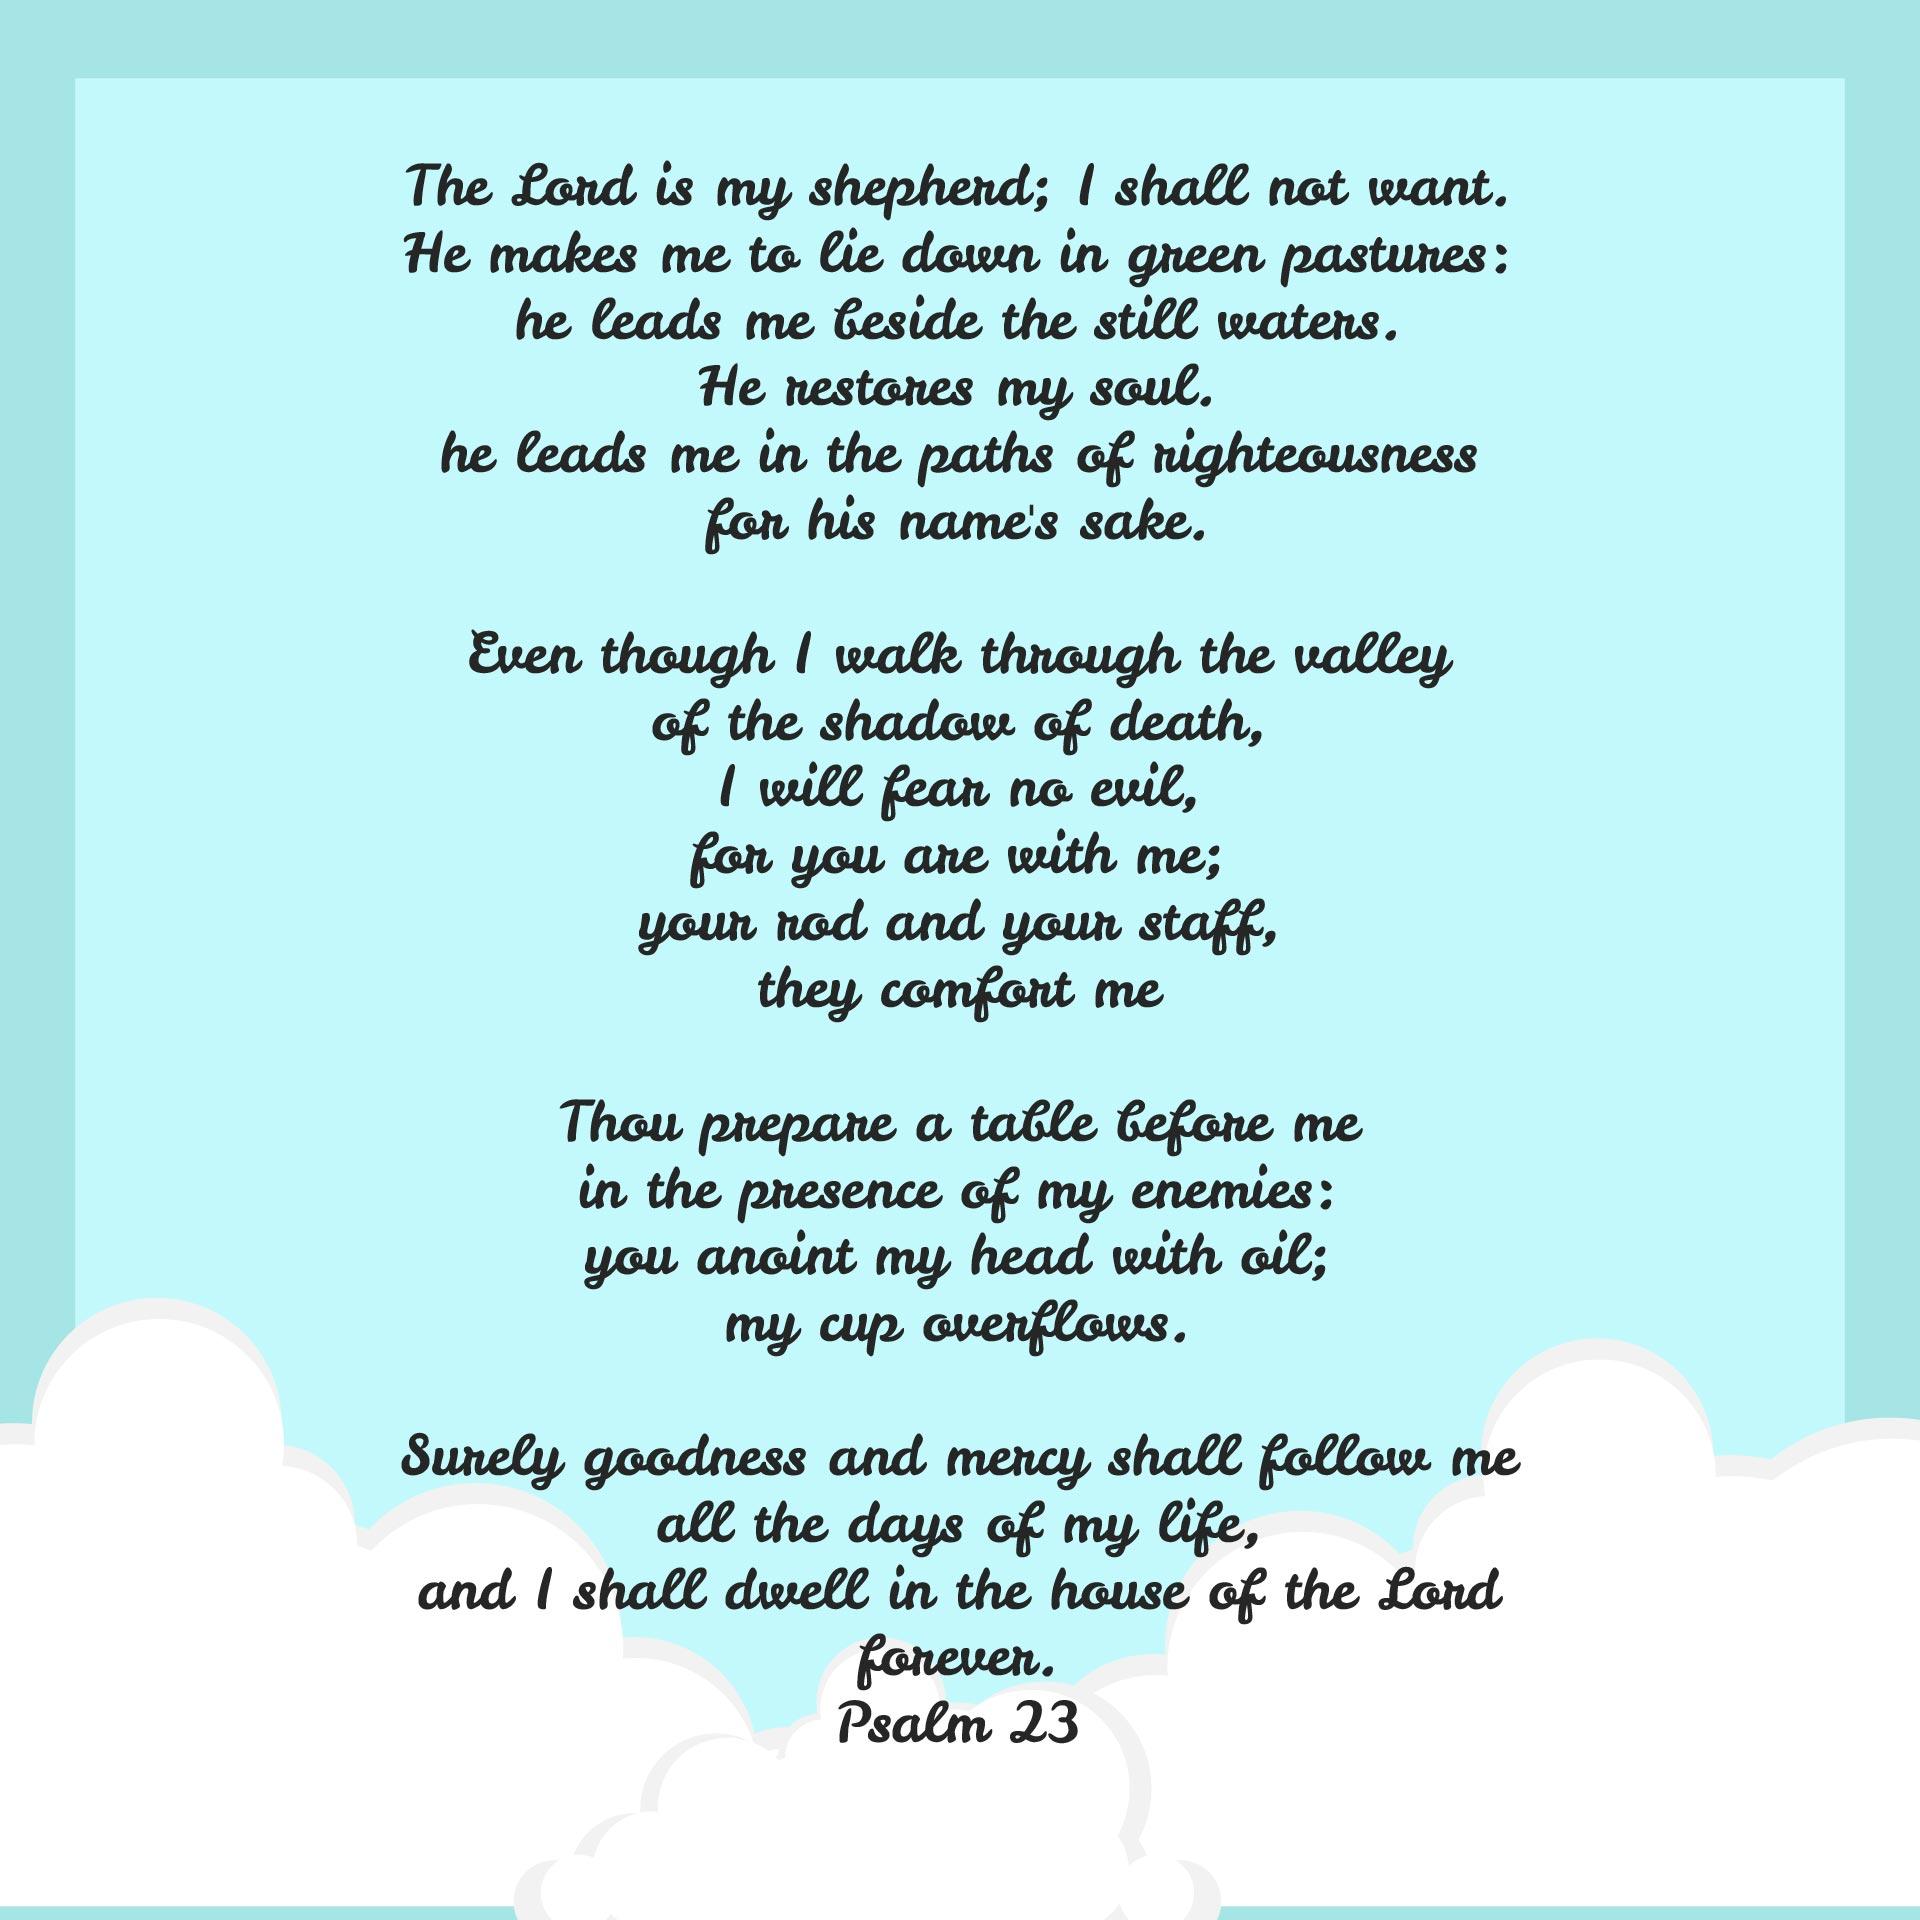 23rd Psalm Printable Version